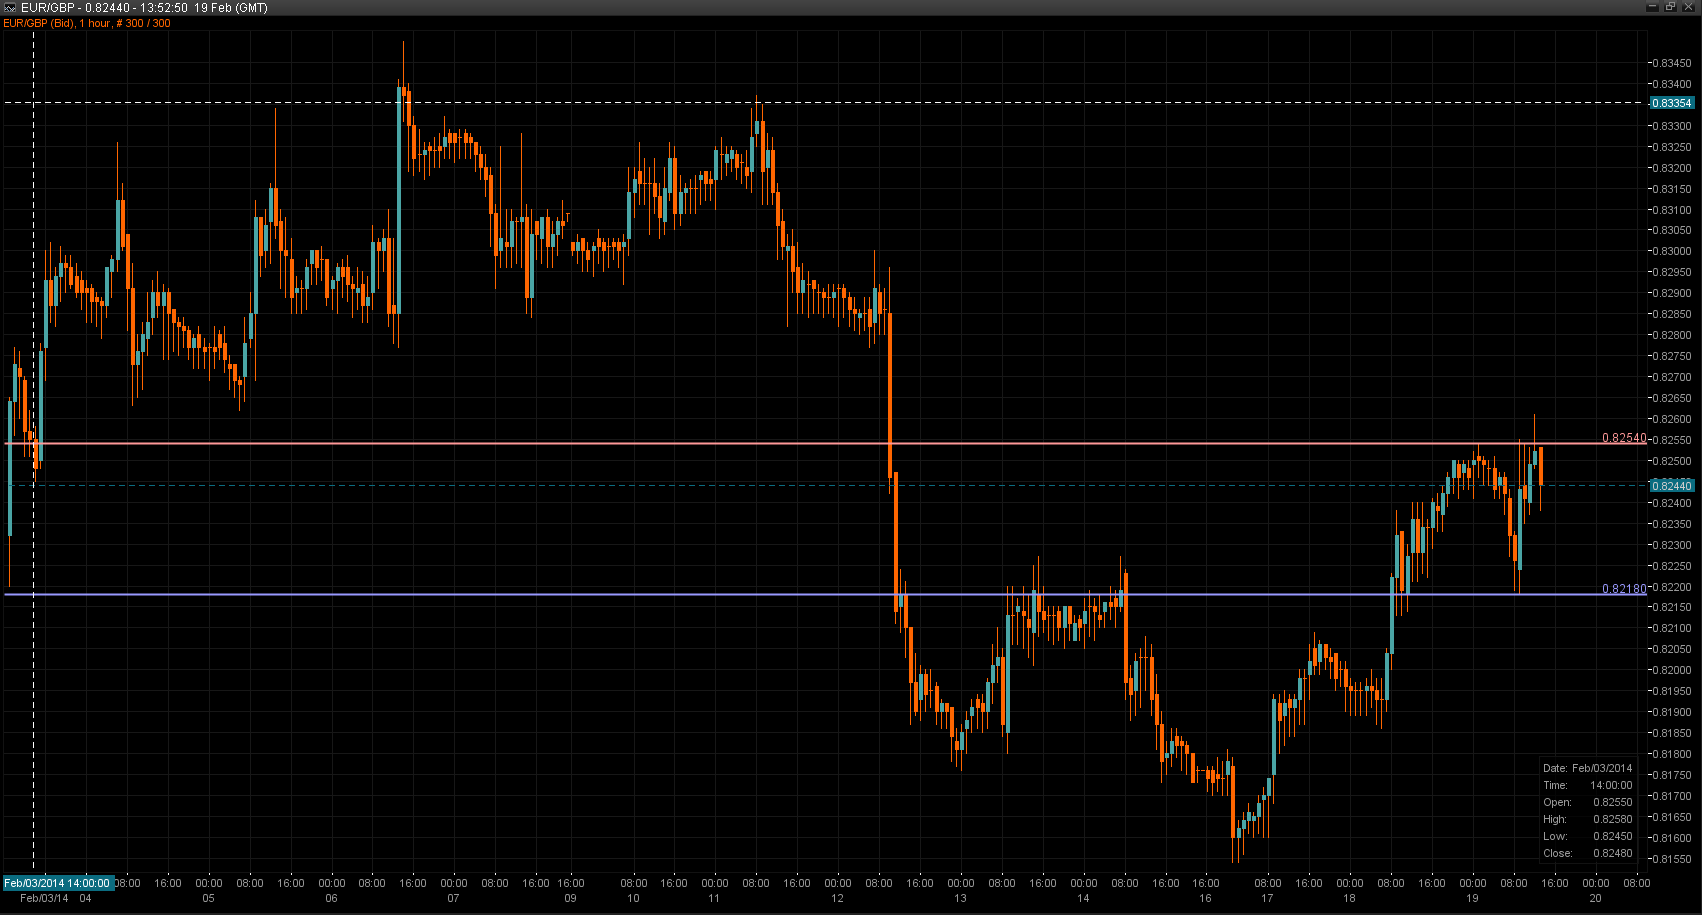 EUR/GBP Chart 19 Feb 2014